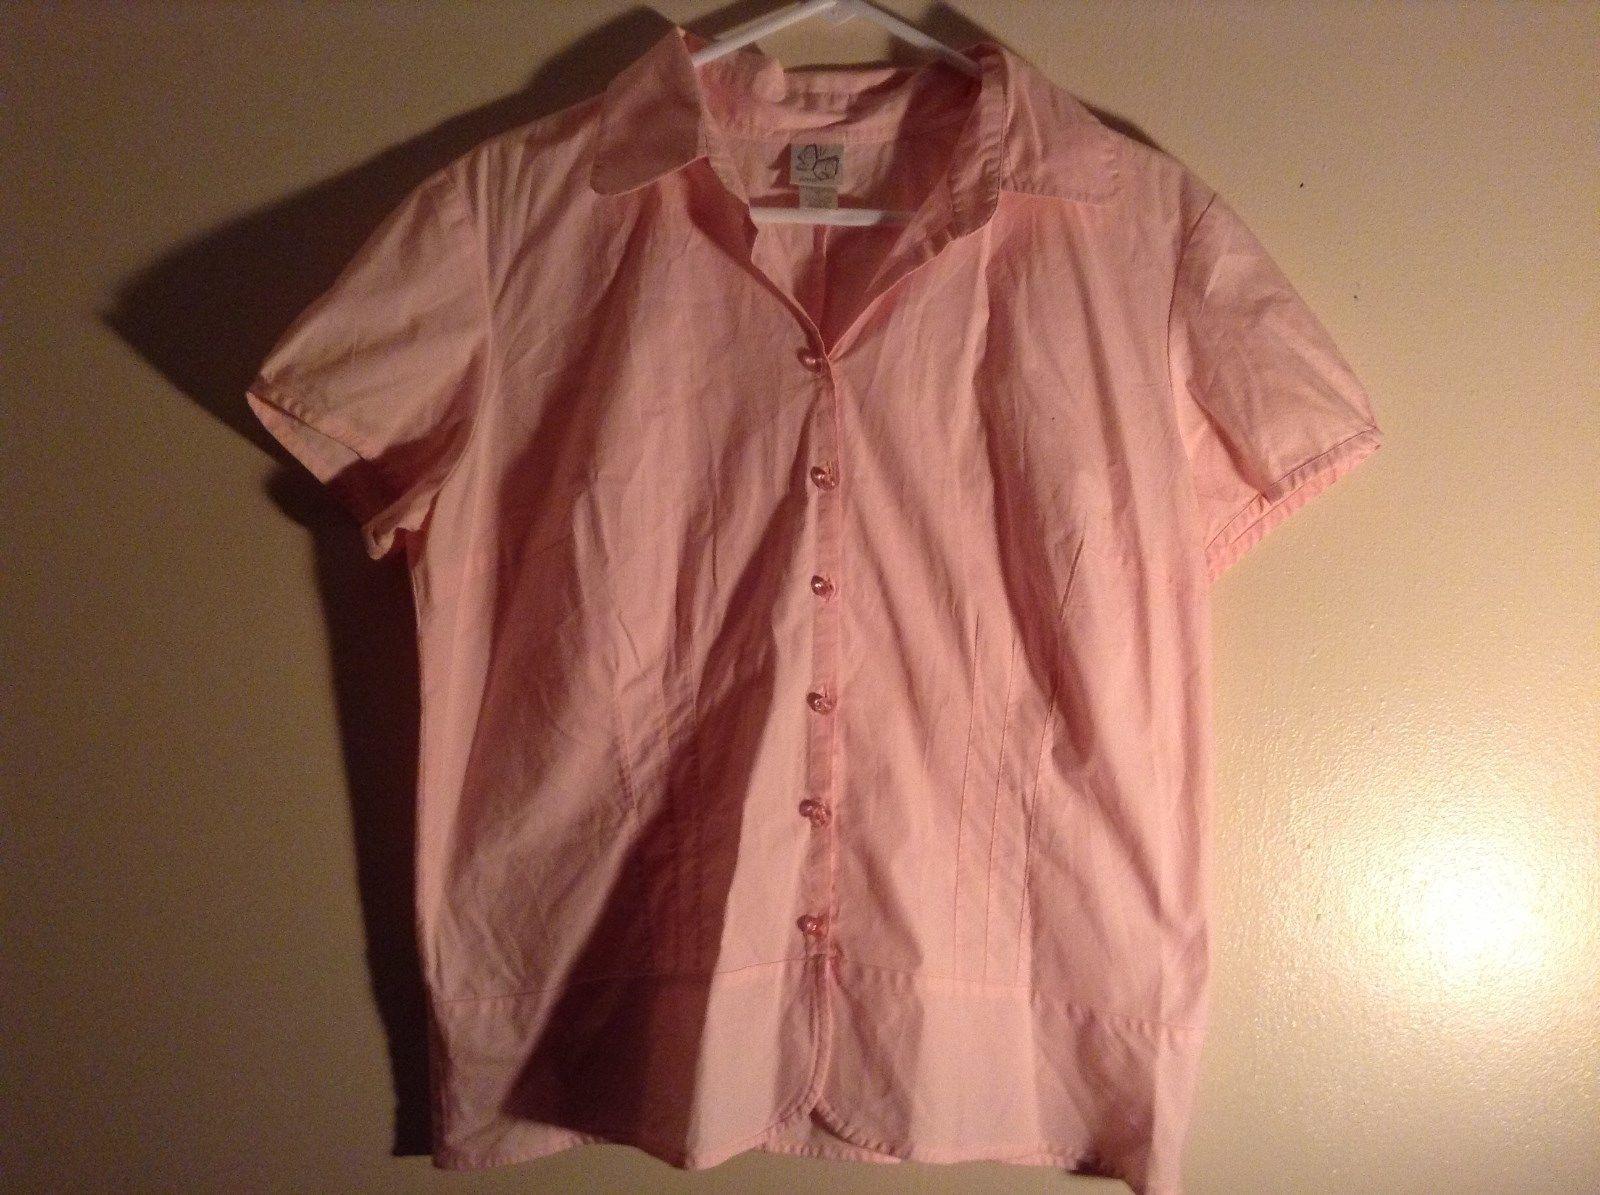 Salmon Pink Button Up Stretch Short Sleeve Shirt Size XL